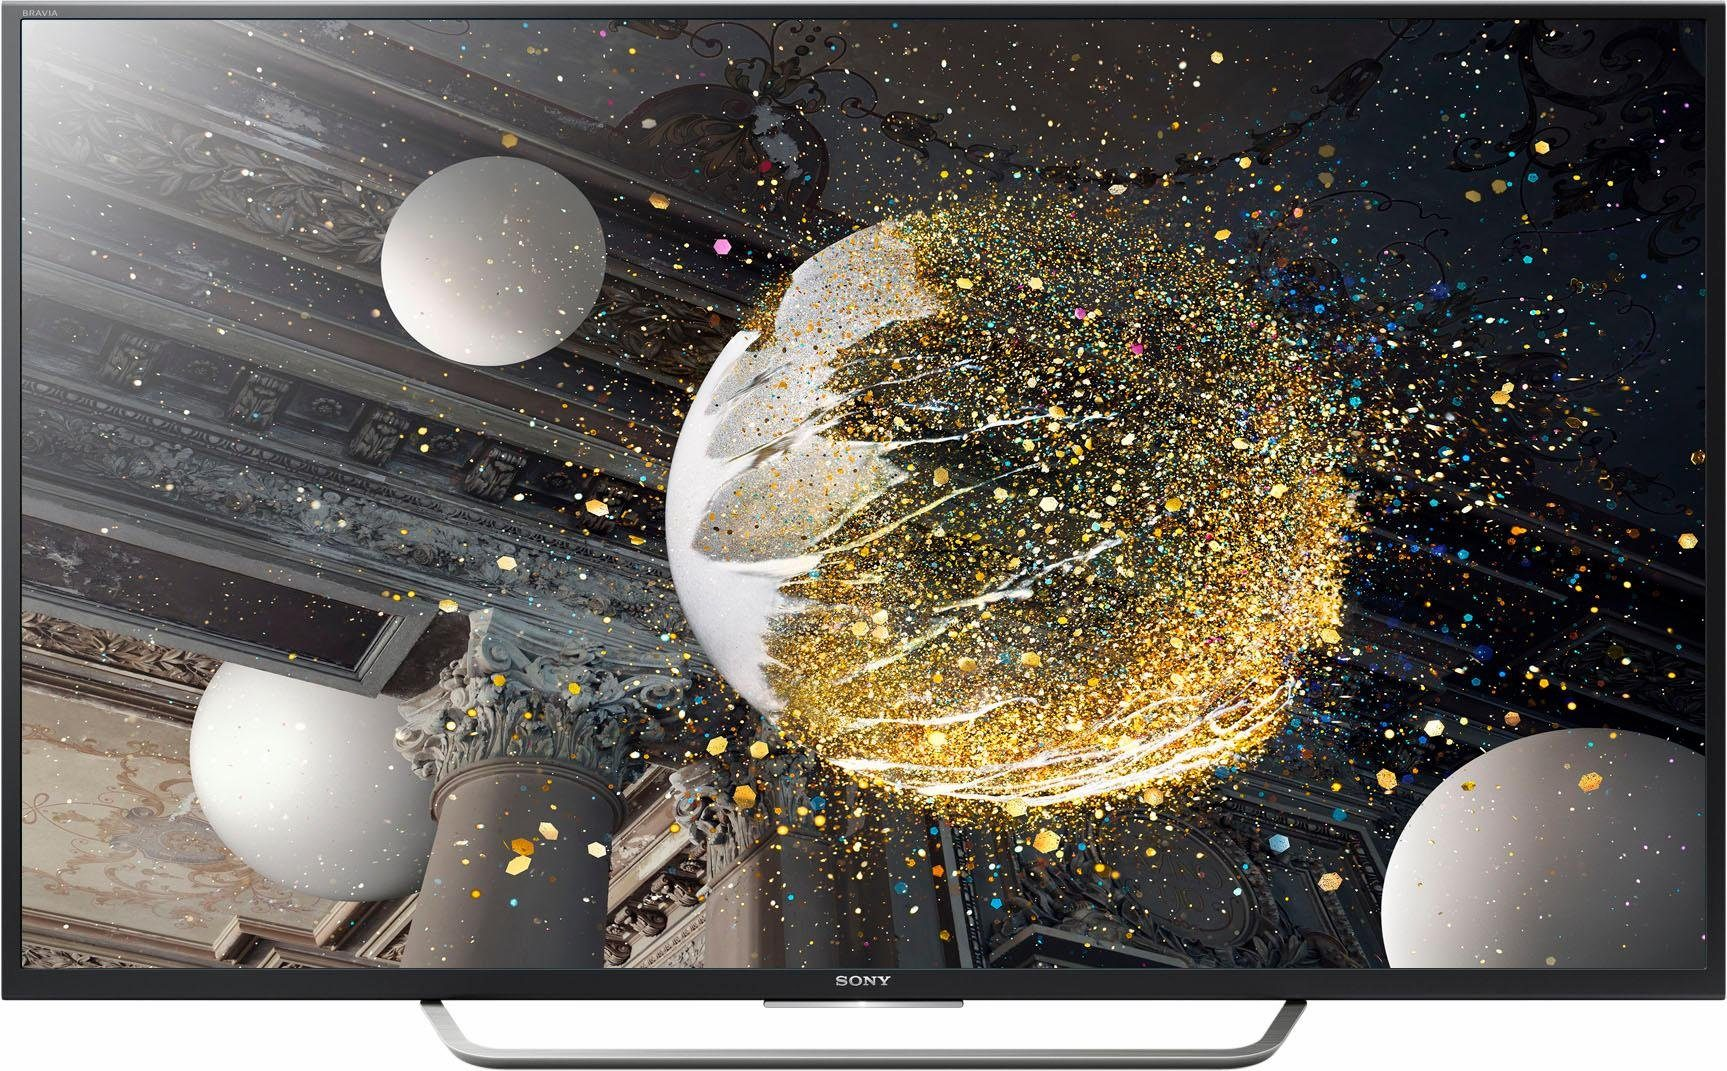 Sony KD-55XD7005, LED Fernseher, 139 cm (55 Zoll), 2160p (4K Ultra HD), HDR, Smart-TV